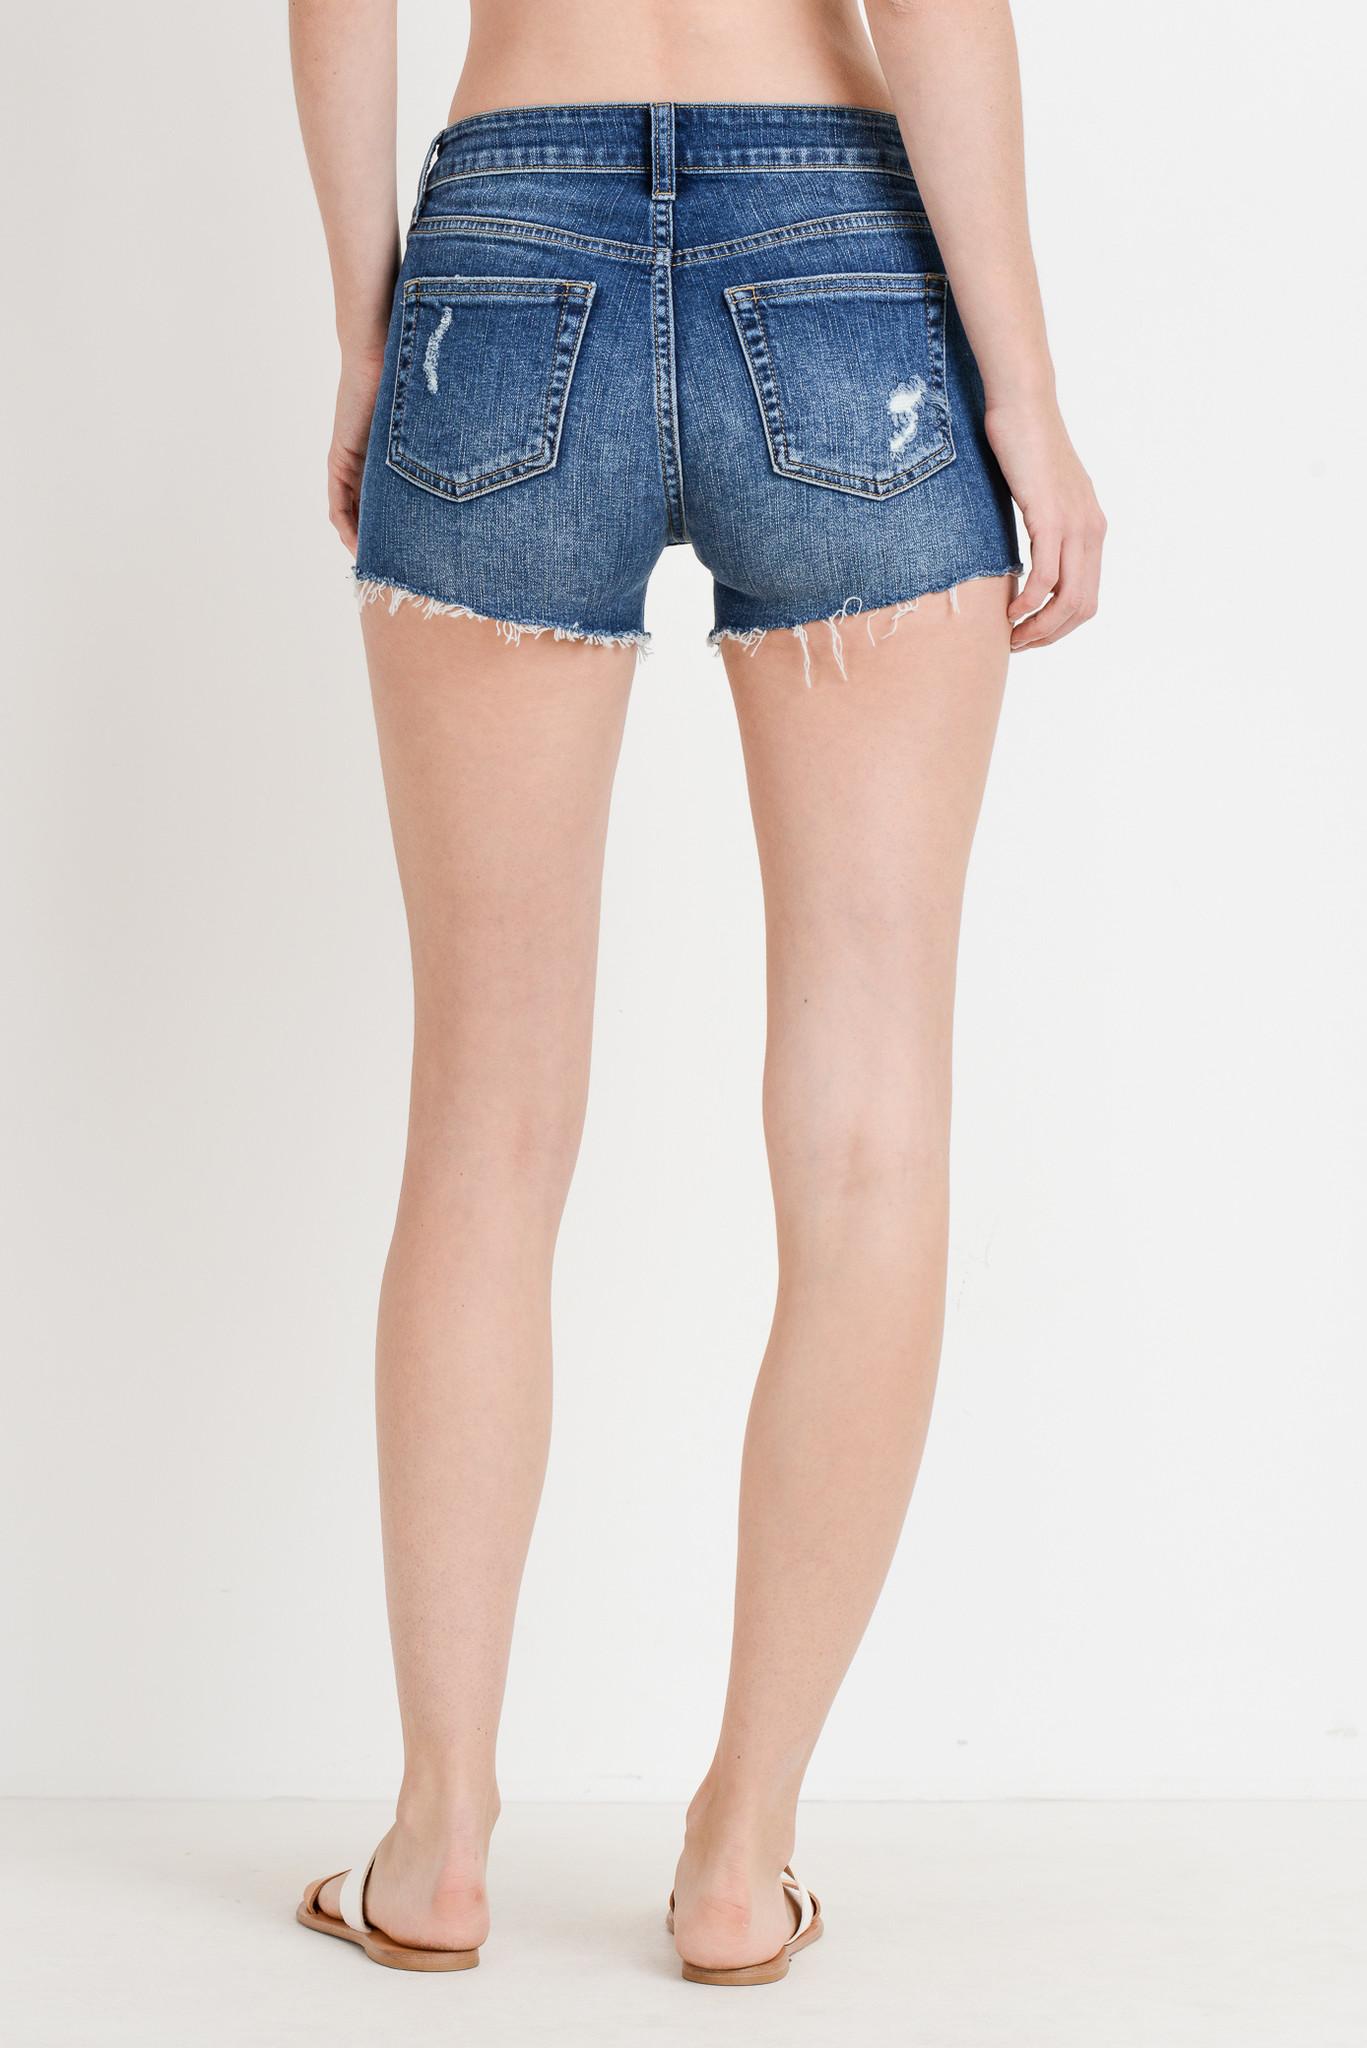 Just Black Denim Peek A Boo Pocket Shorts